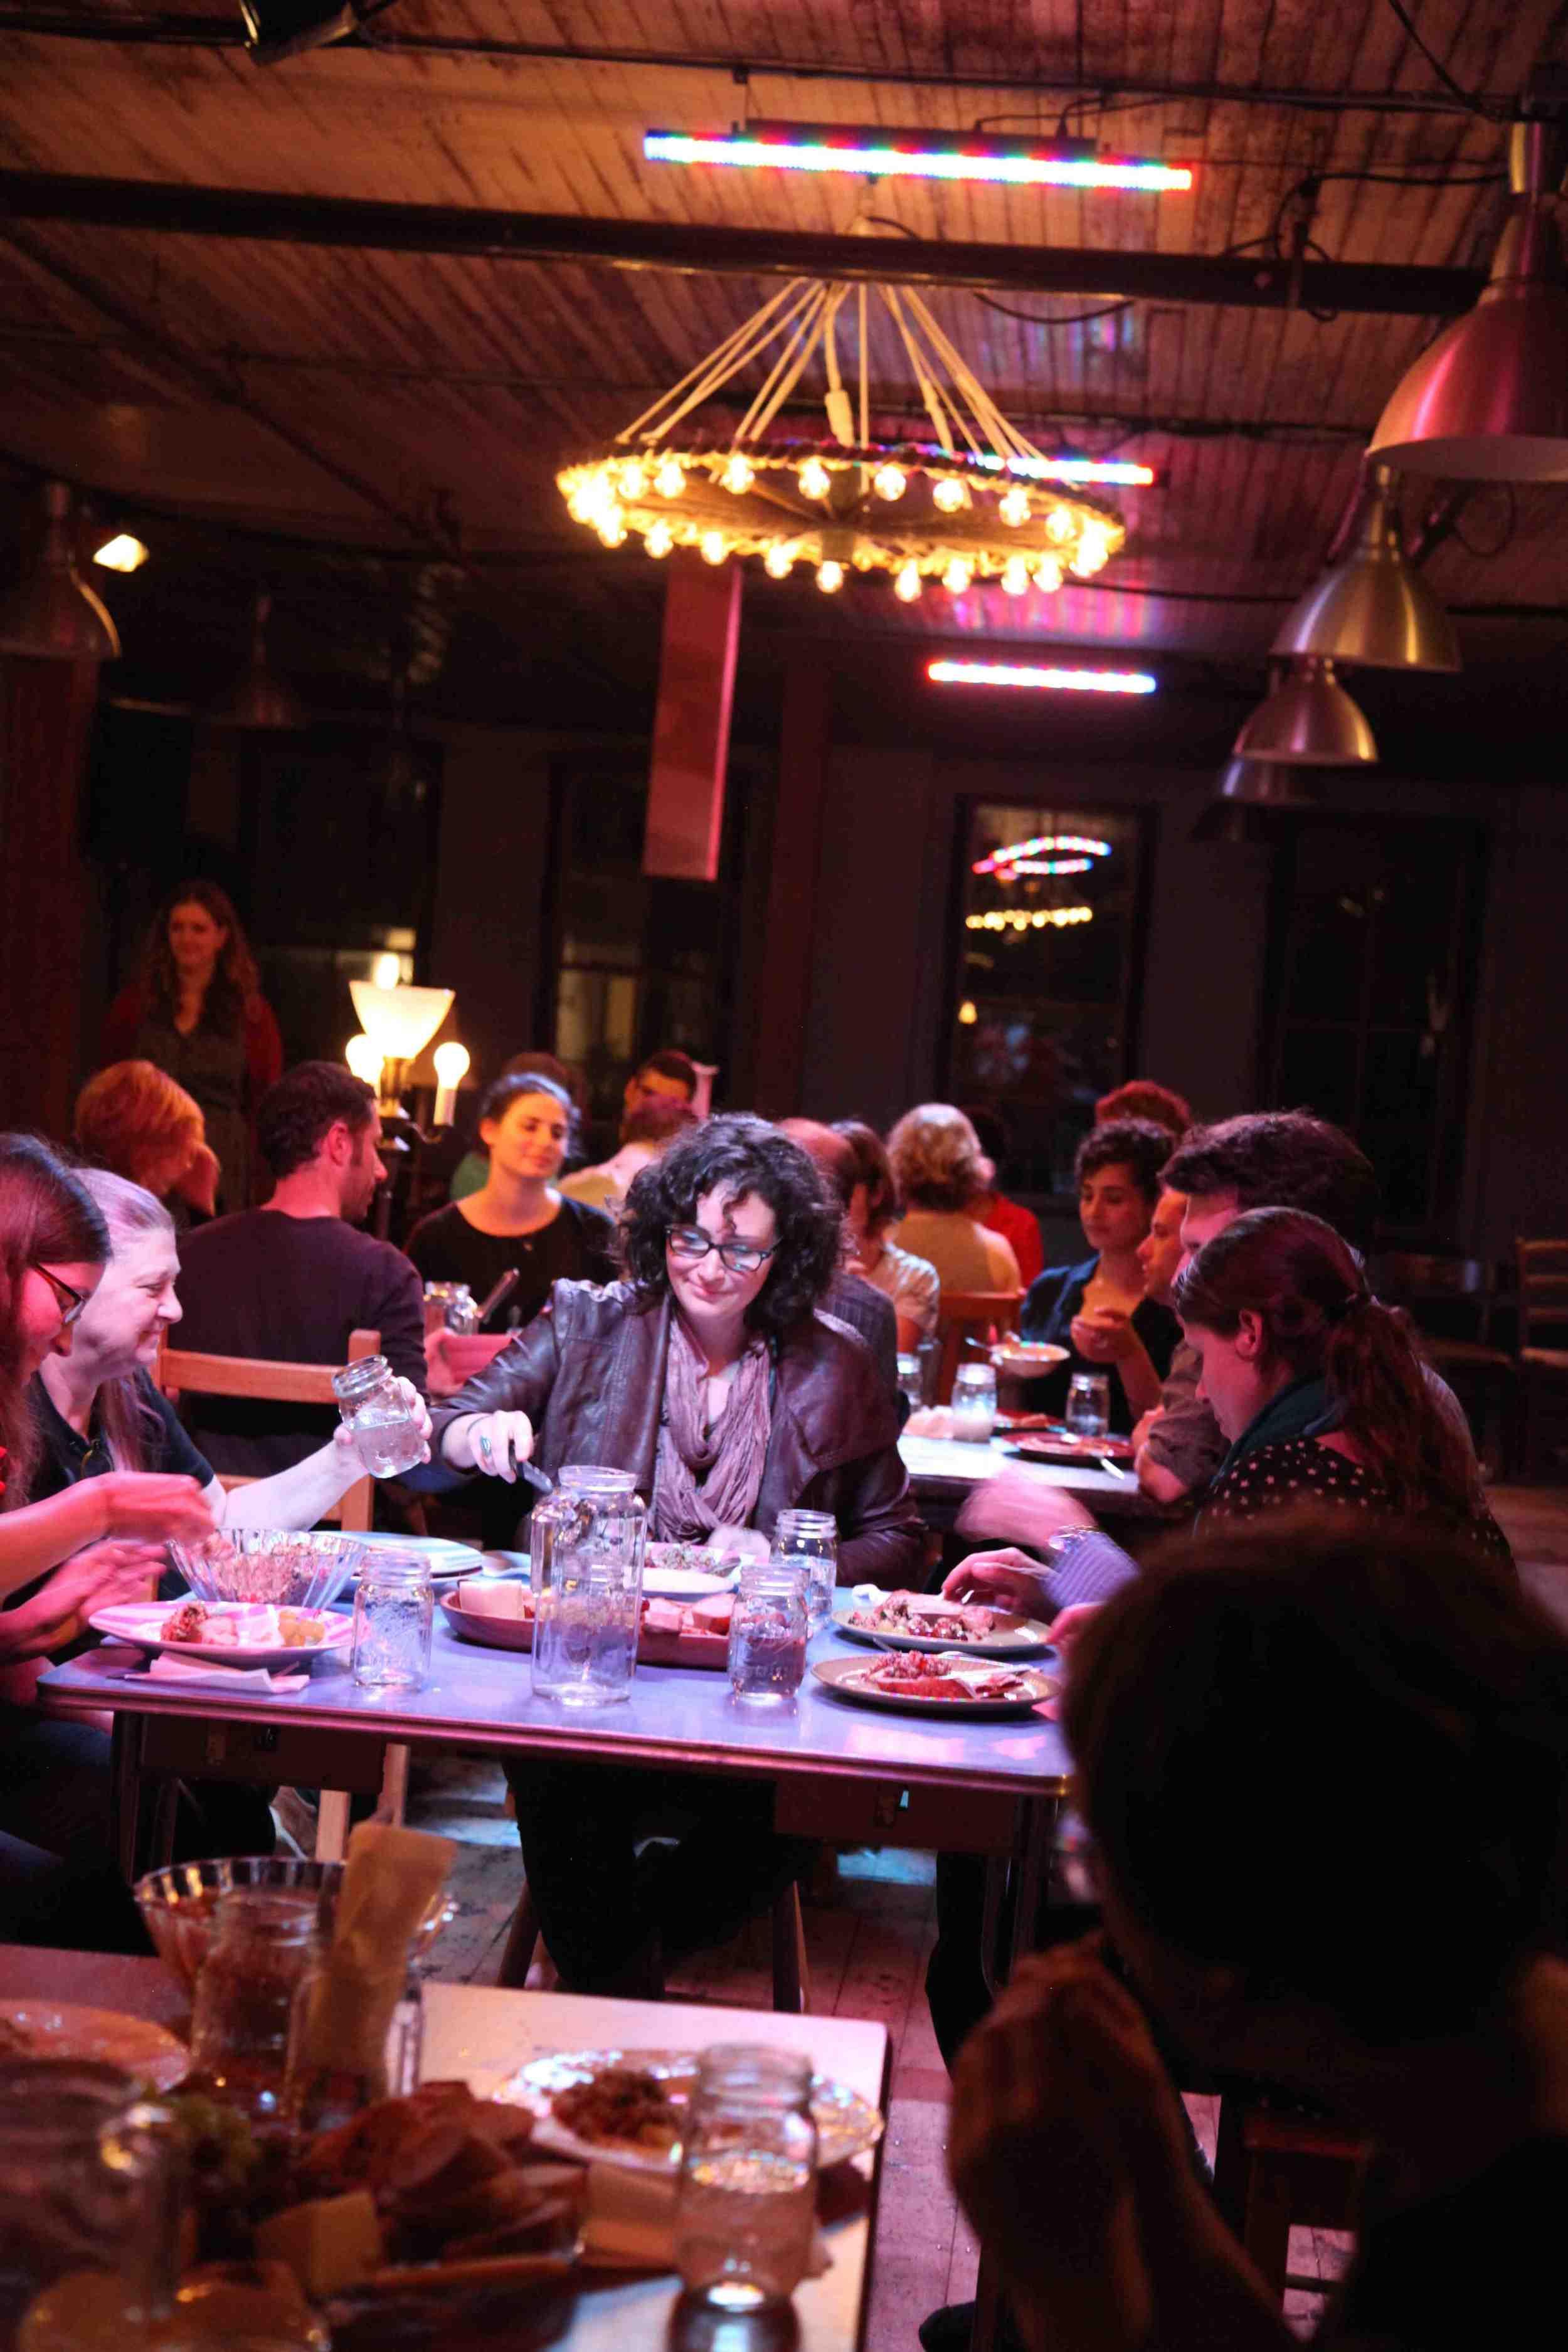 FO-PressSelect-2- The Feast (pictured), Lauren Rayner (photo credit).jpg